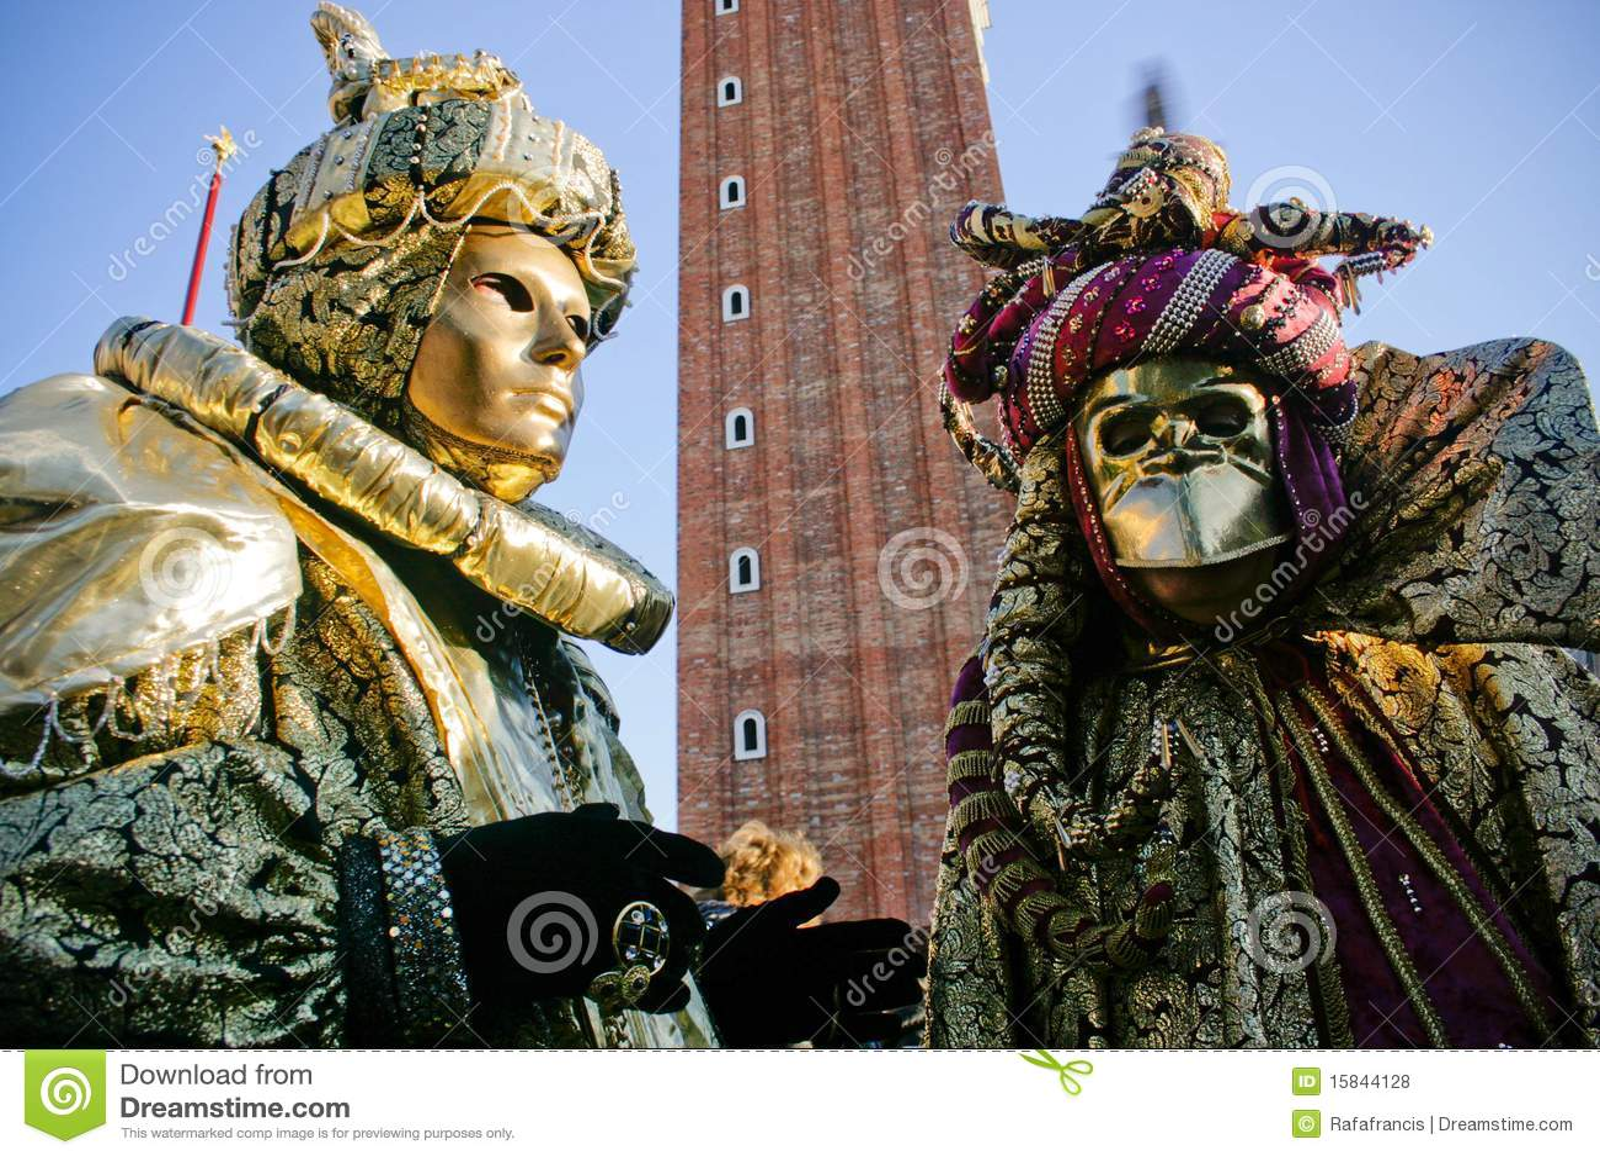 Venetian Carnival Costumes Stock Photo Image Of Angle